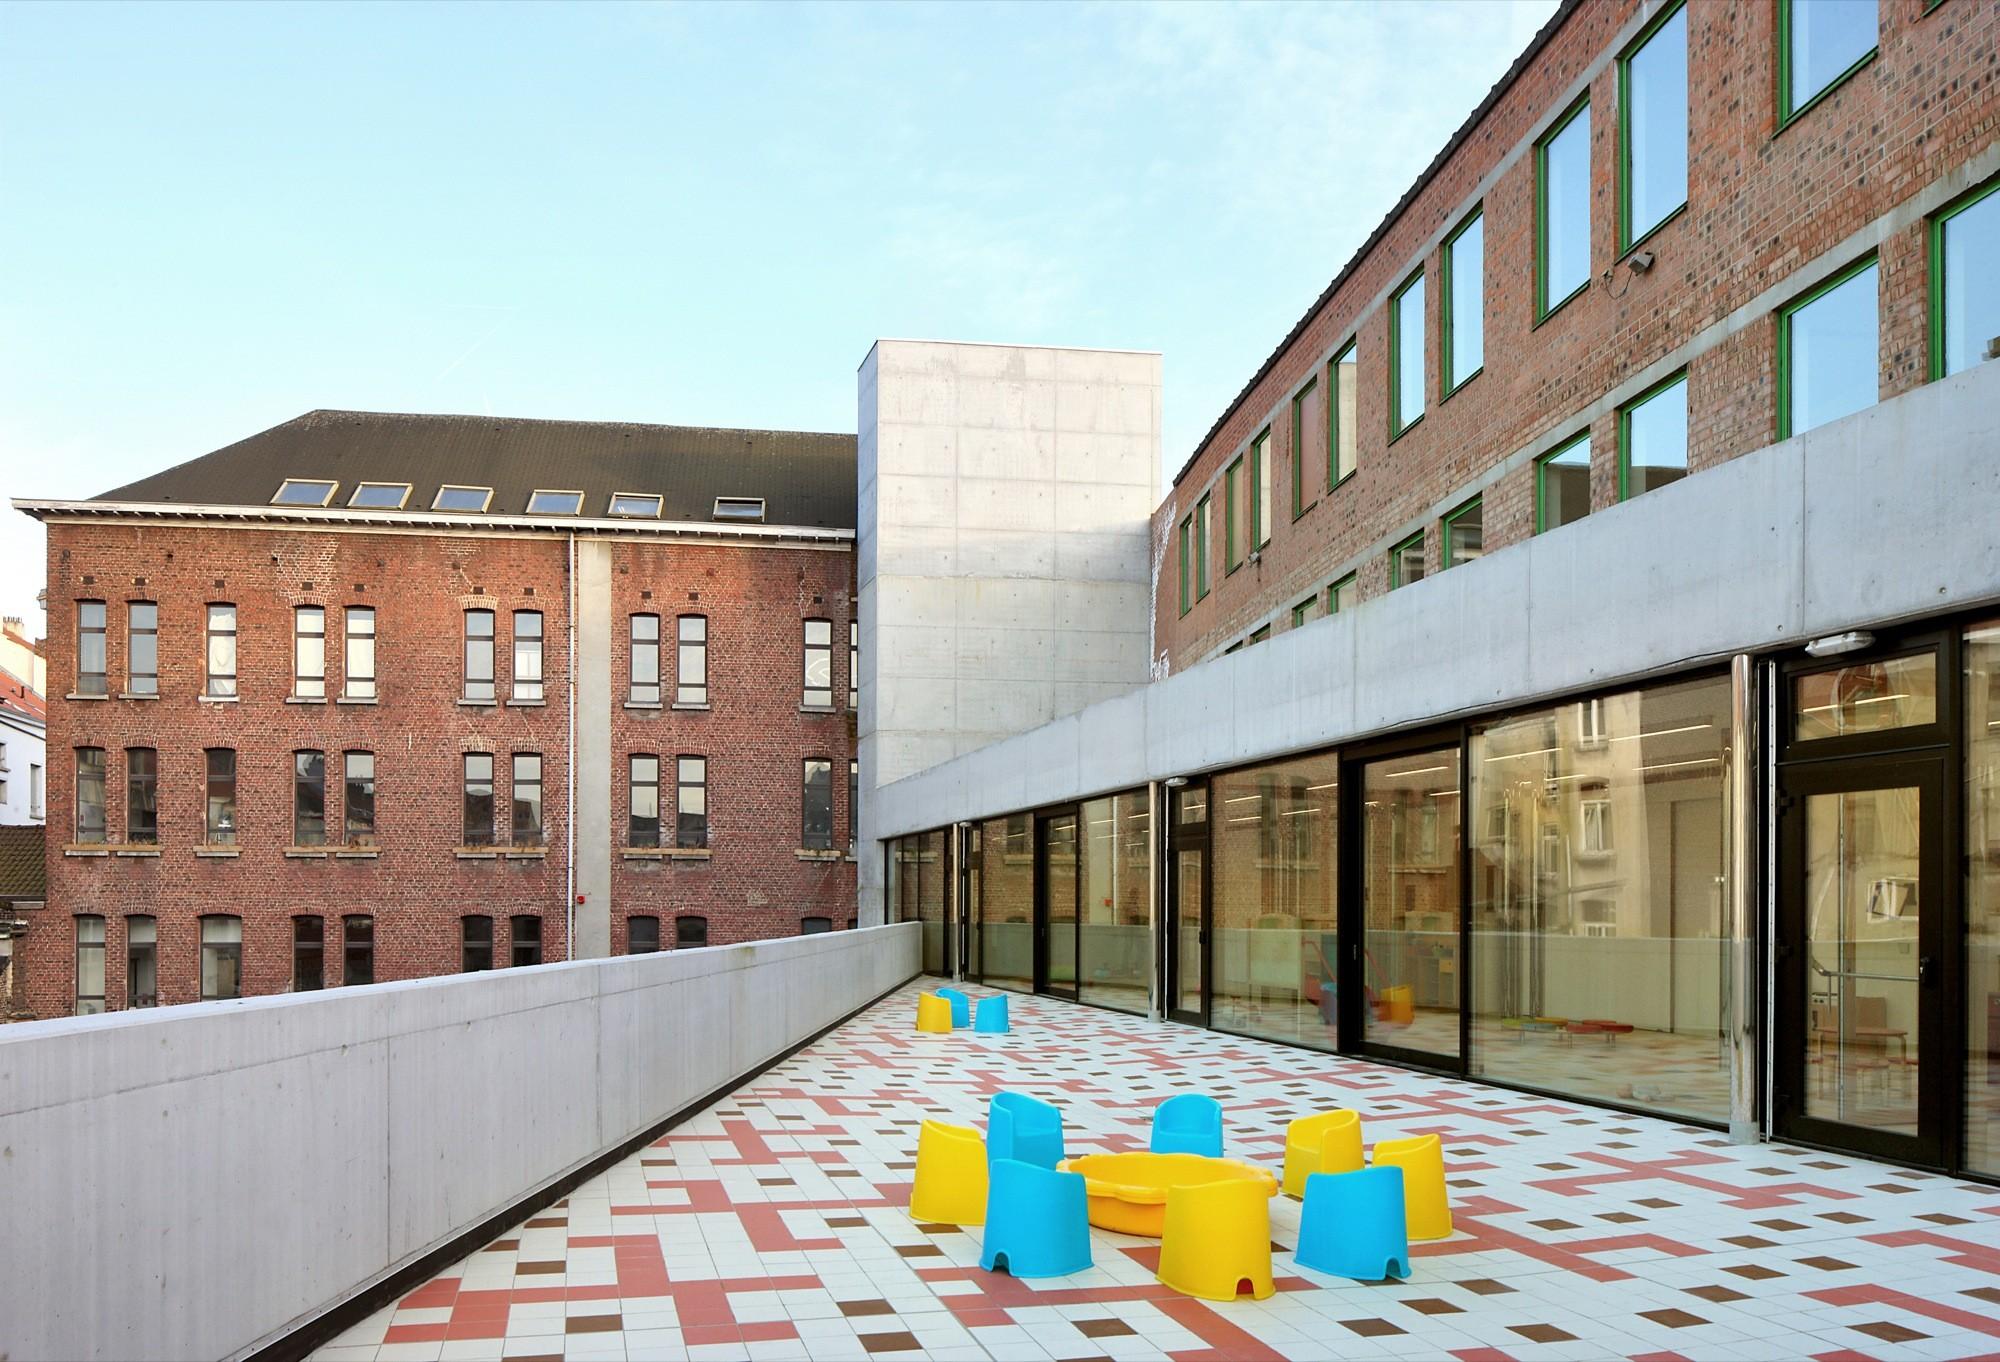 Centro Diurno para Niños / Burobill + ZAmpone architectuur, © Filip Dujardin